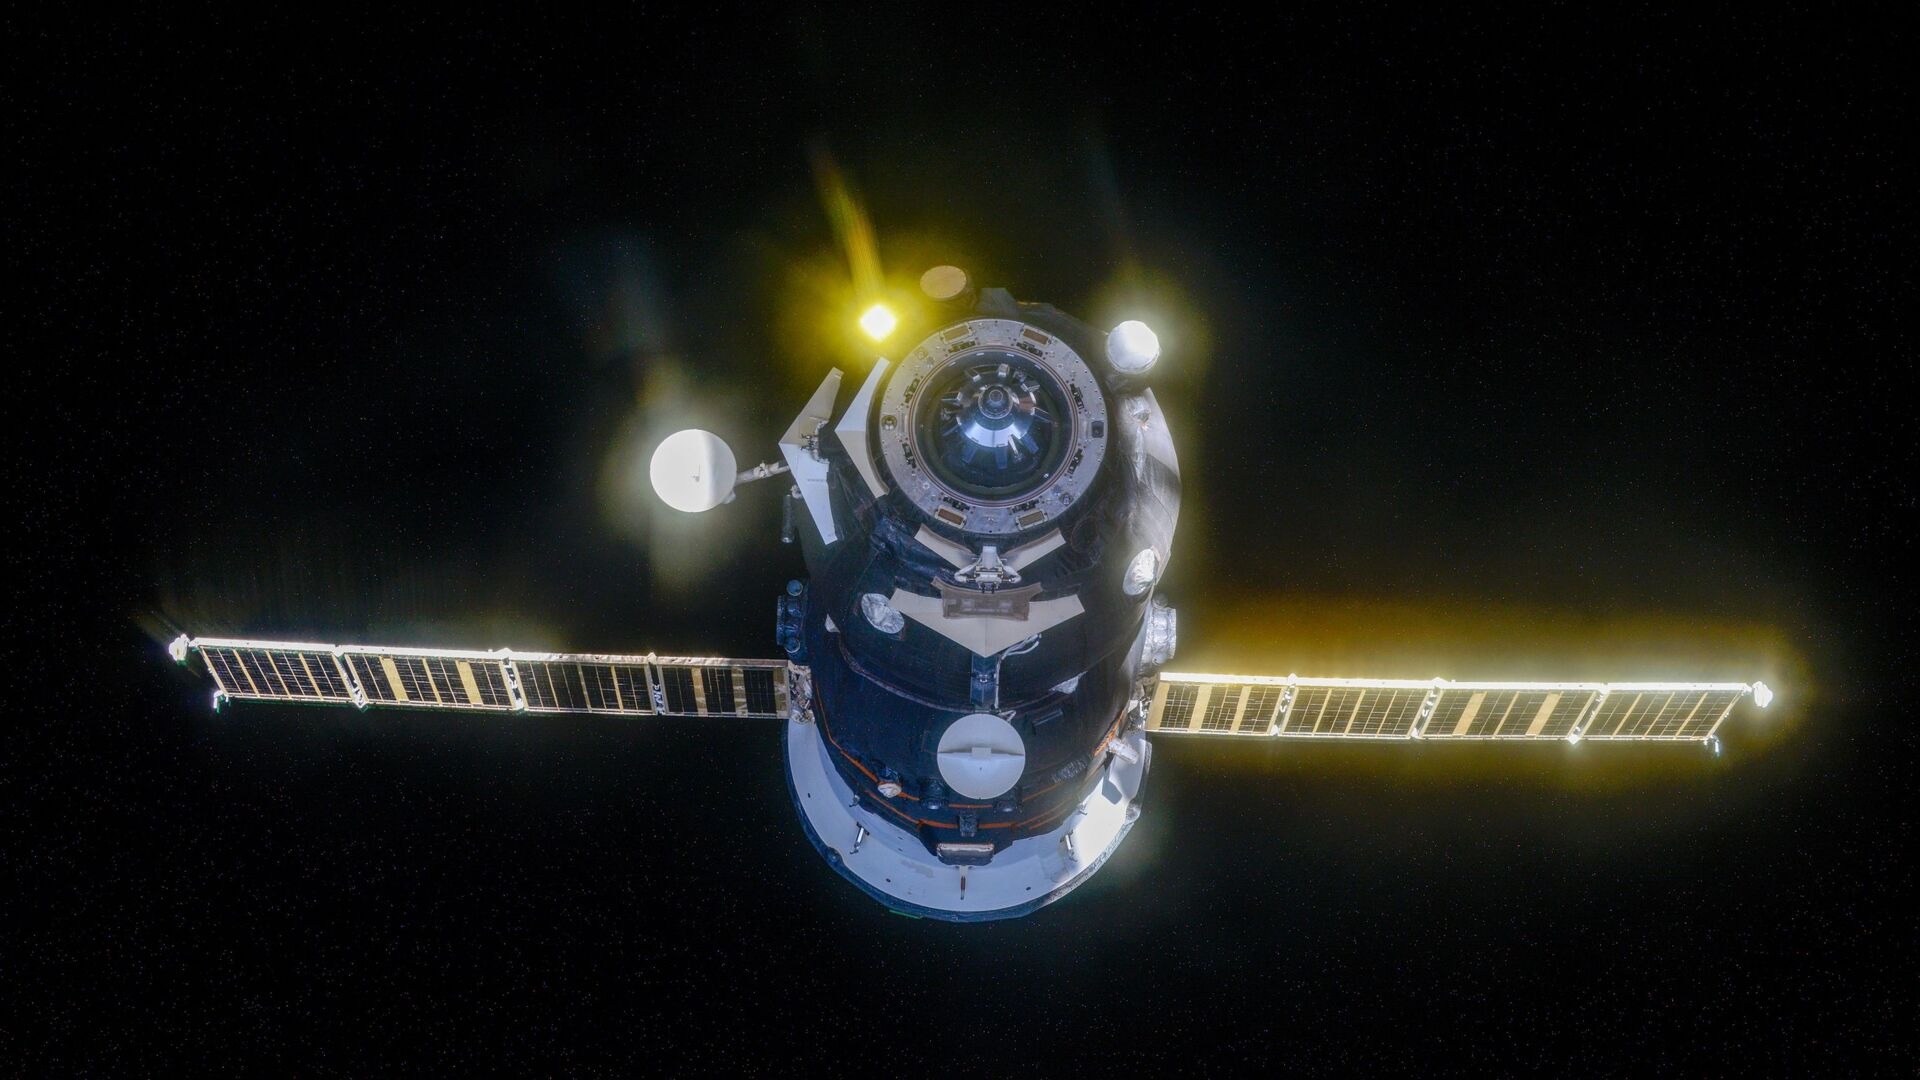 El carguero espacial ruso Progress MS-13 - Sputnik Mundo, 1920, 26.07.2021